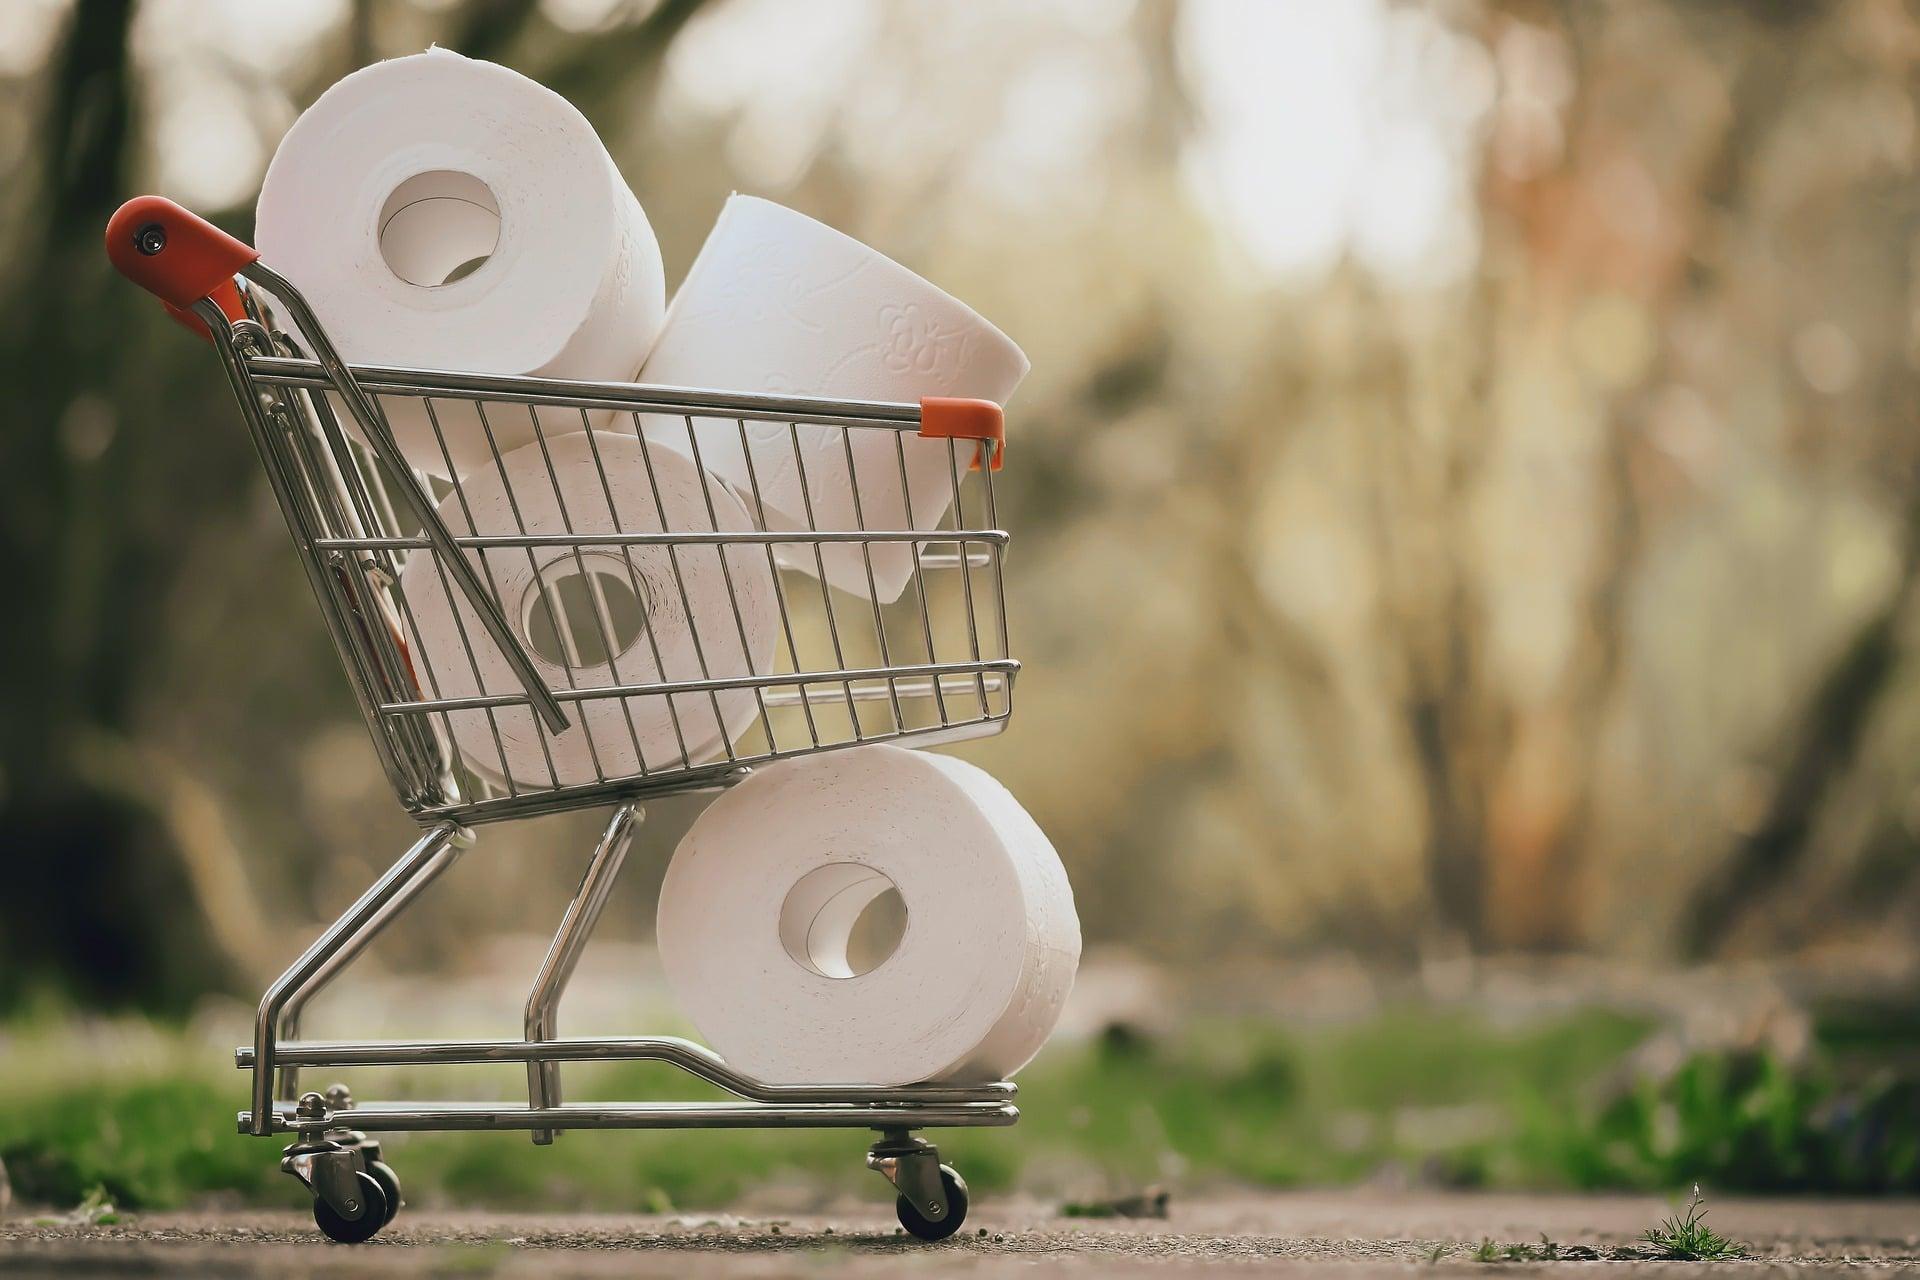 How COVID-19 will change consumer behavior long-term